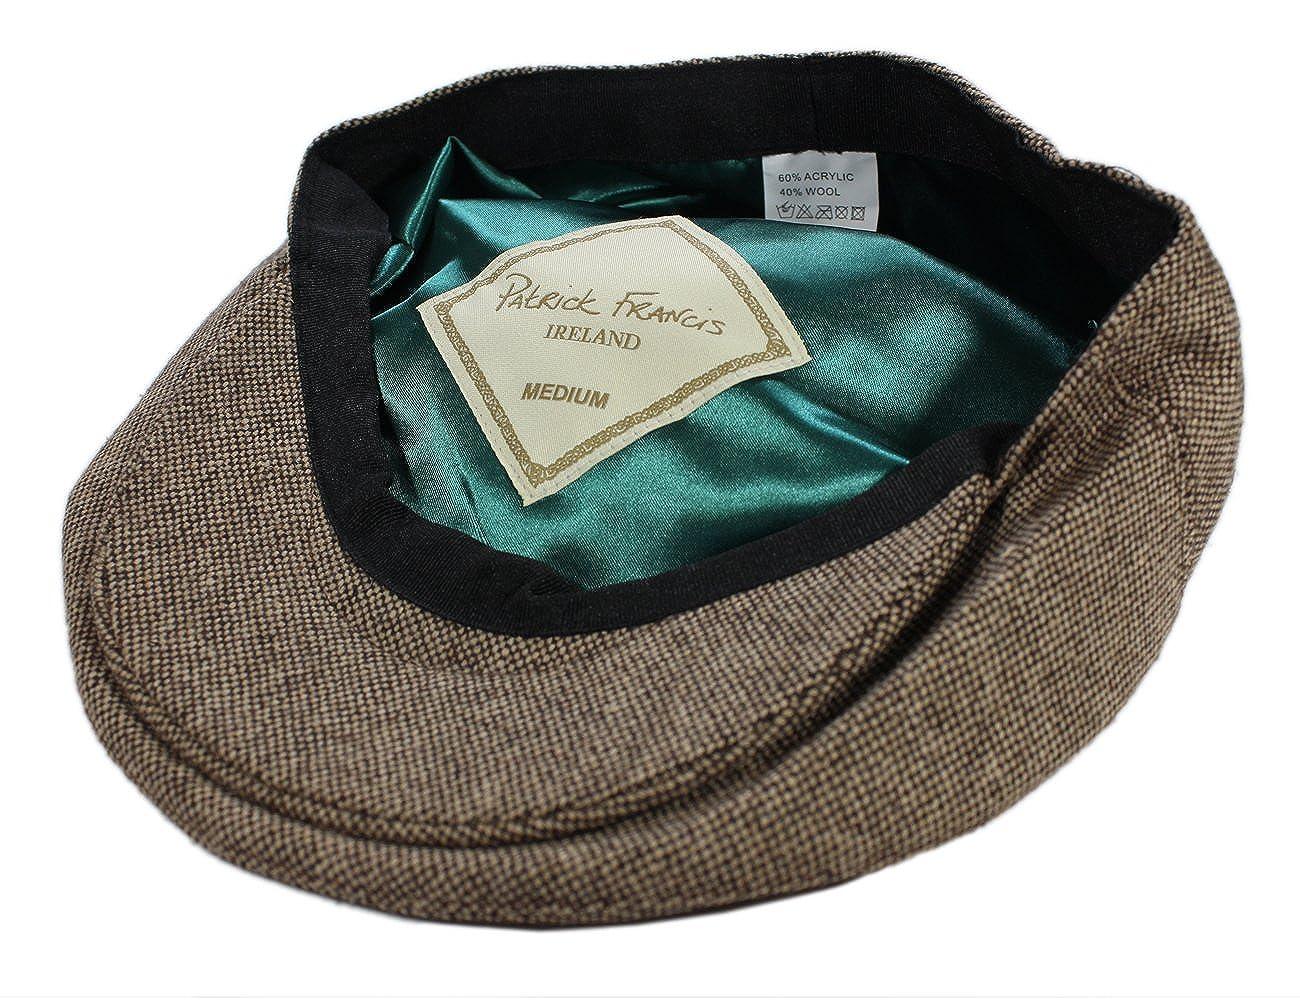 dceffad33 Patrick Francis Men's Ireland Tweed Flat Cap